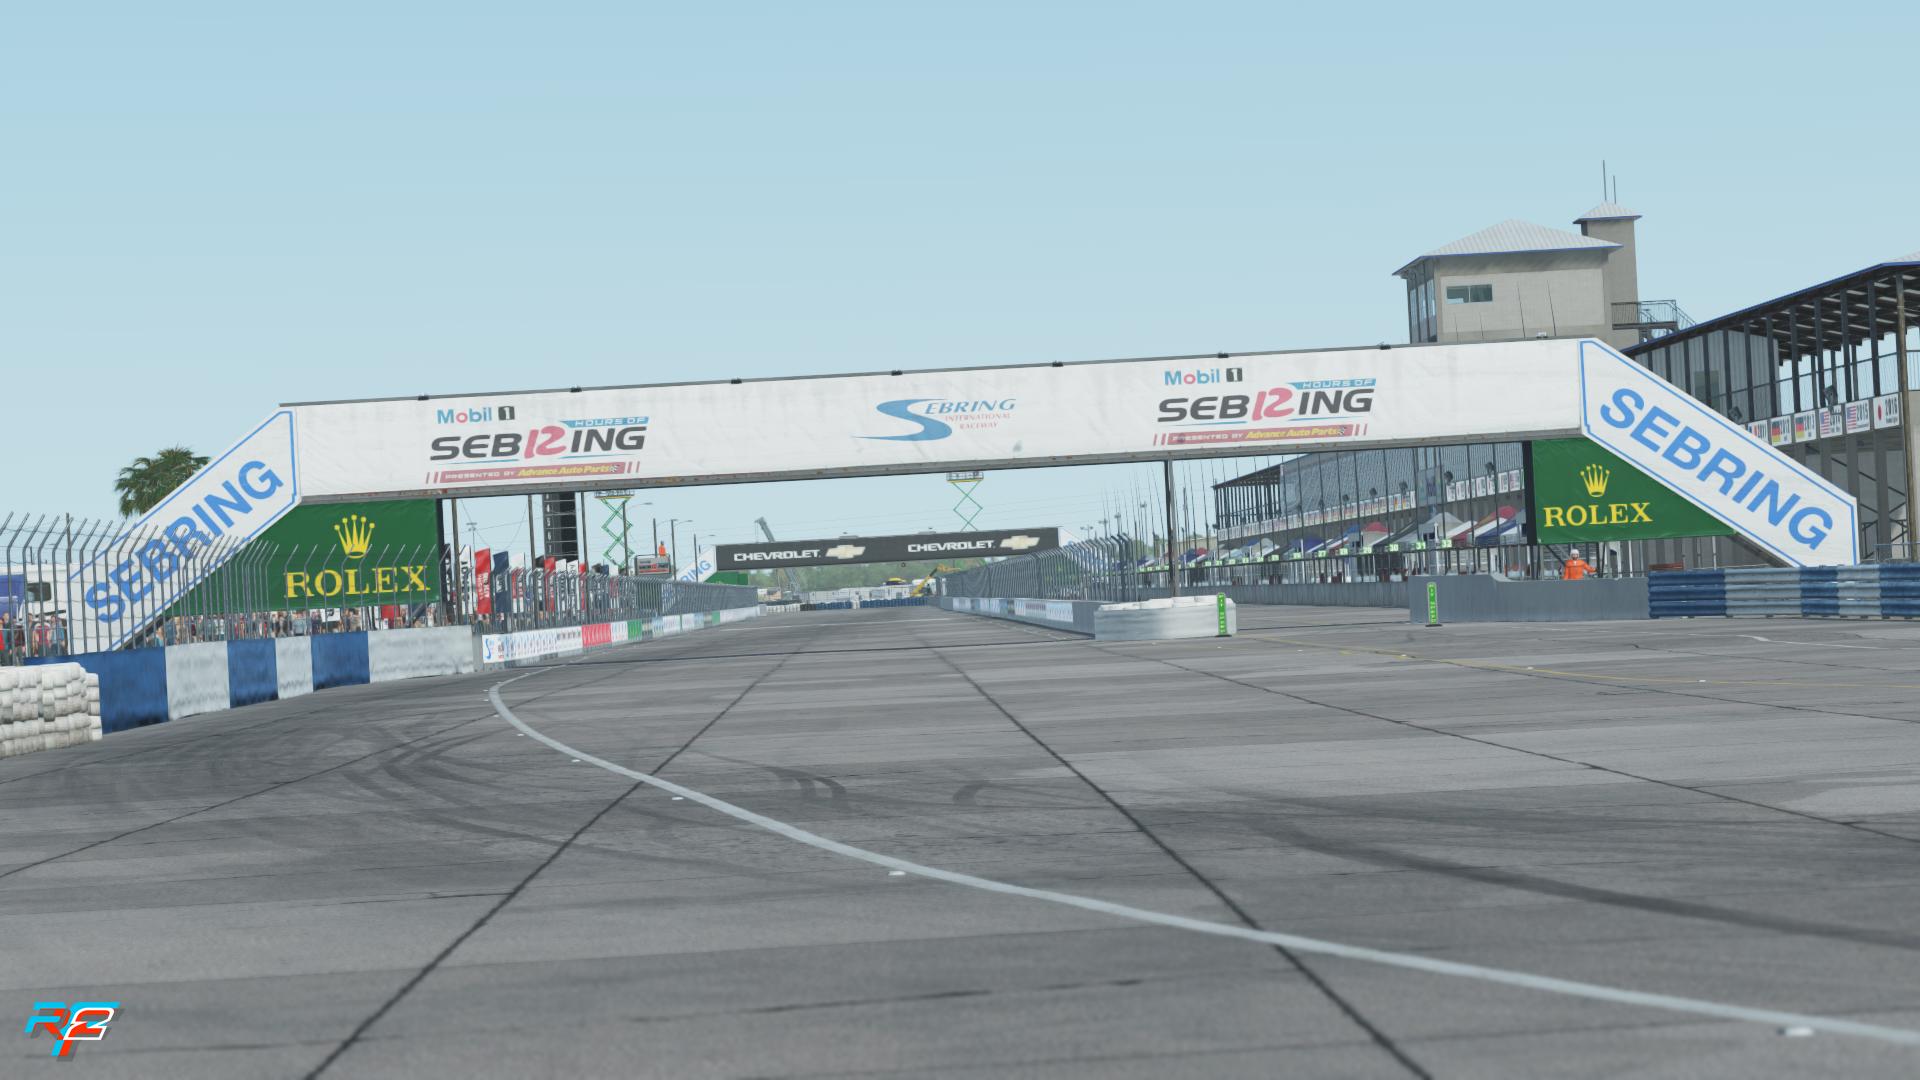 Sebring_2021_screen_01.jpg